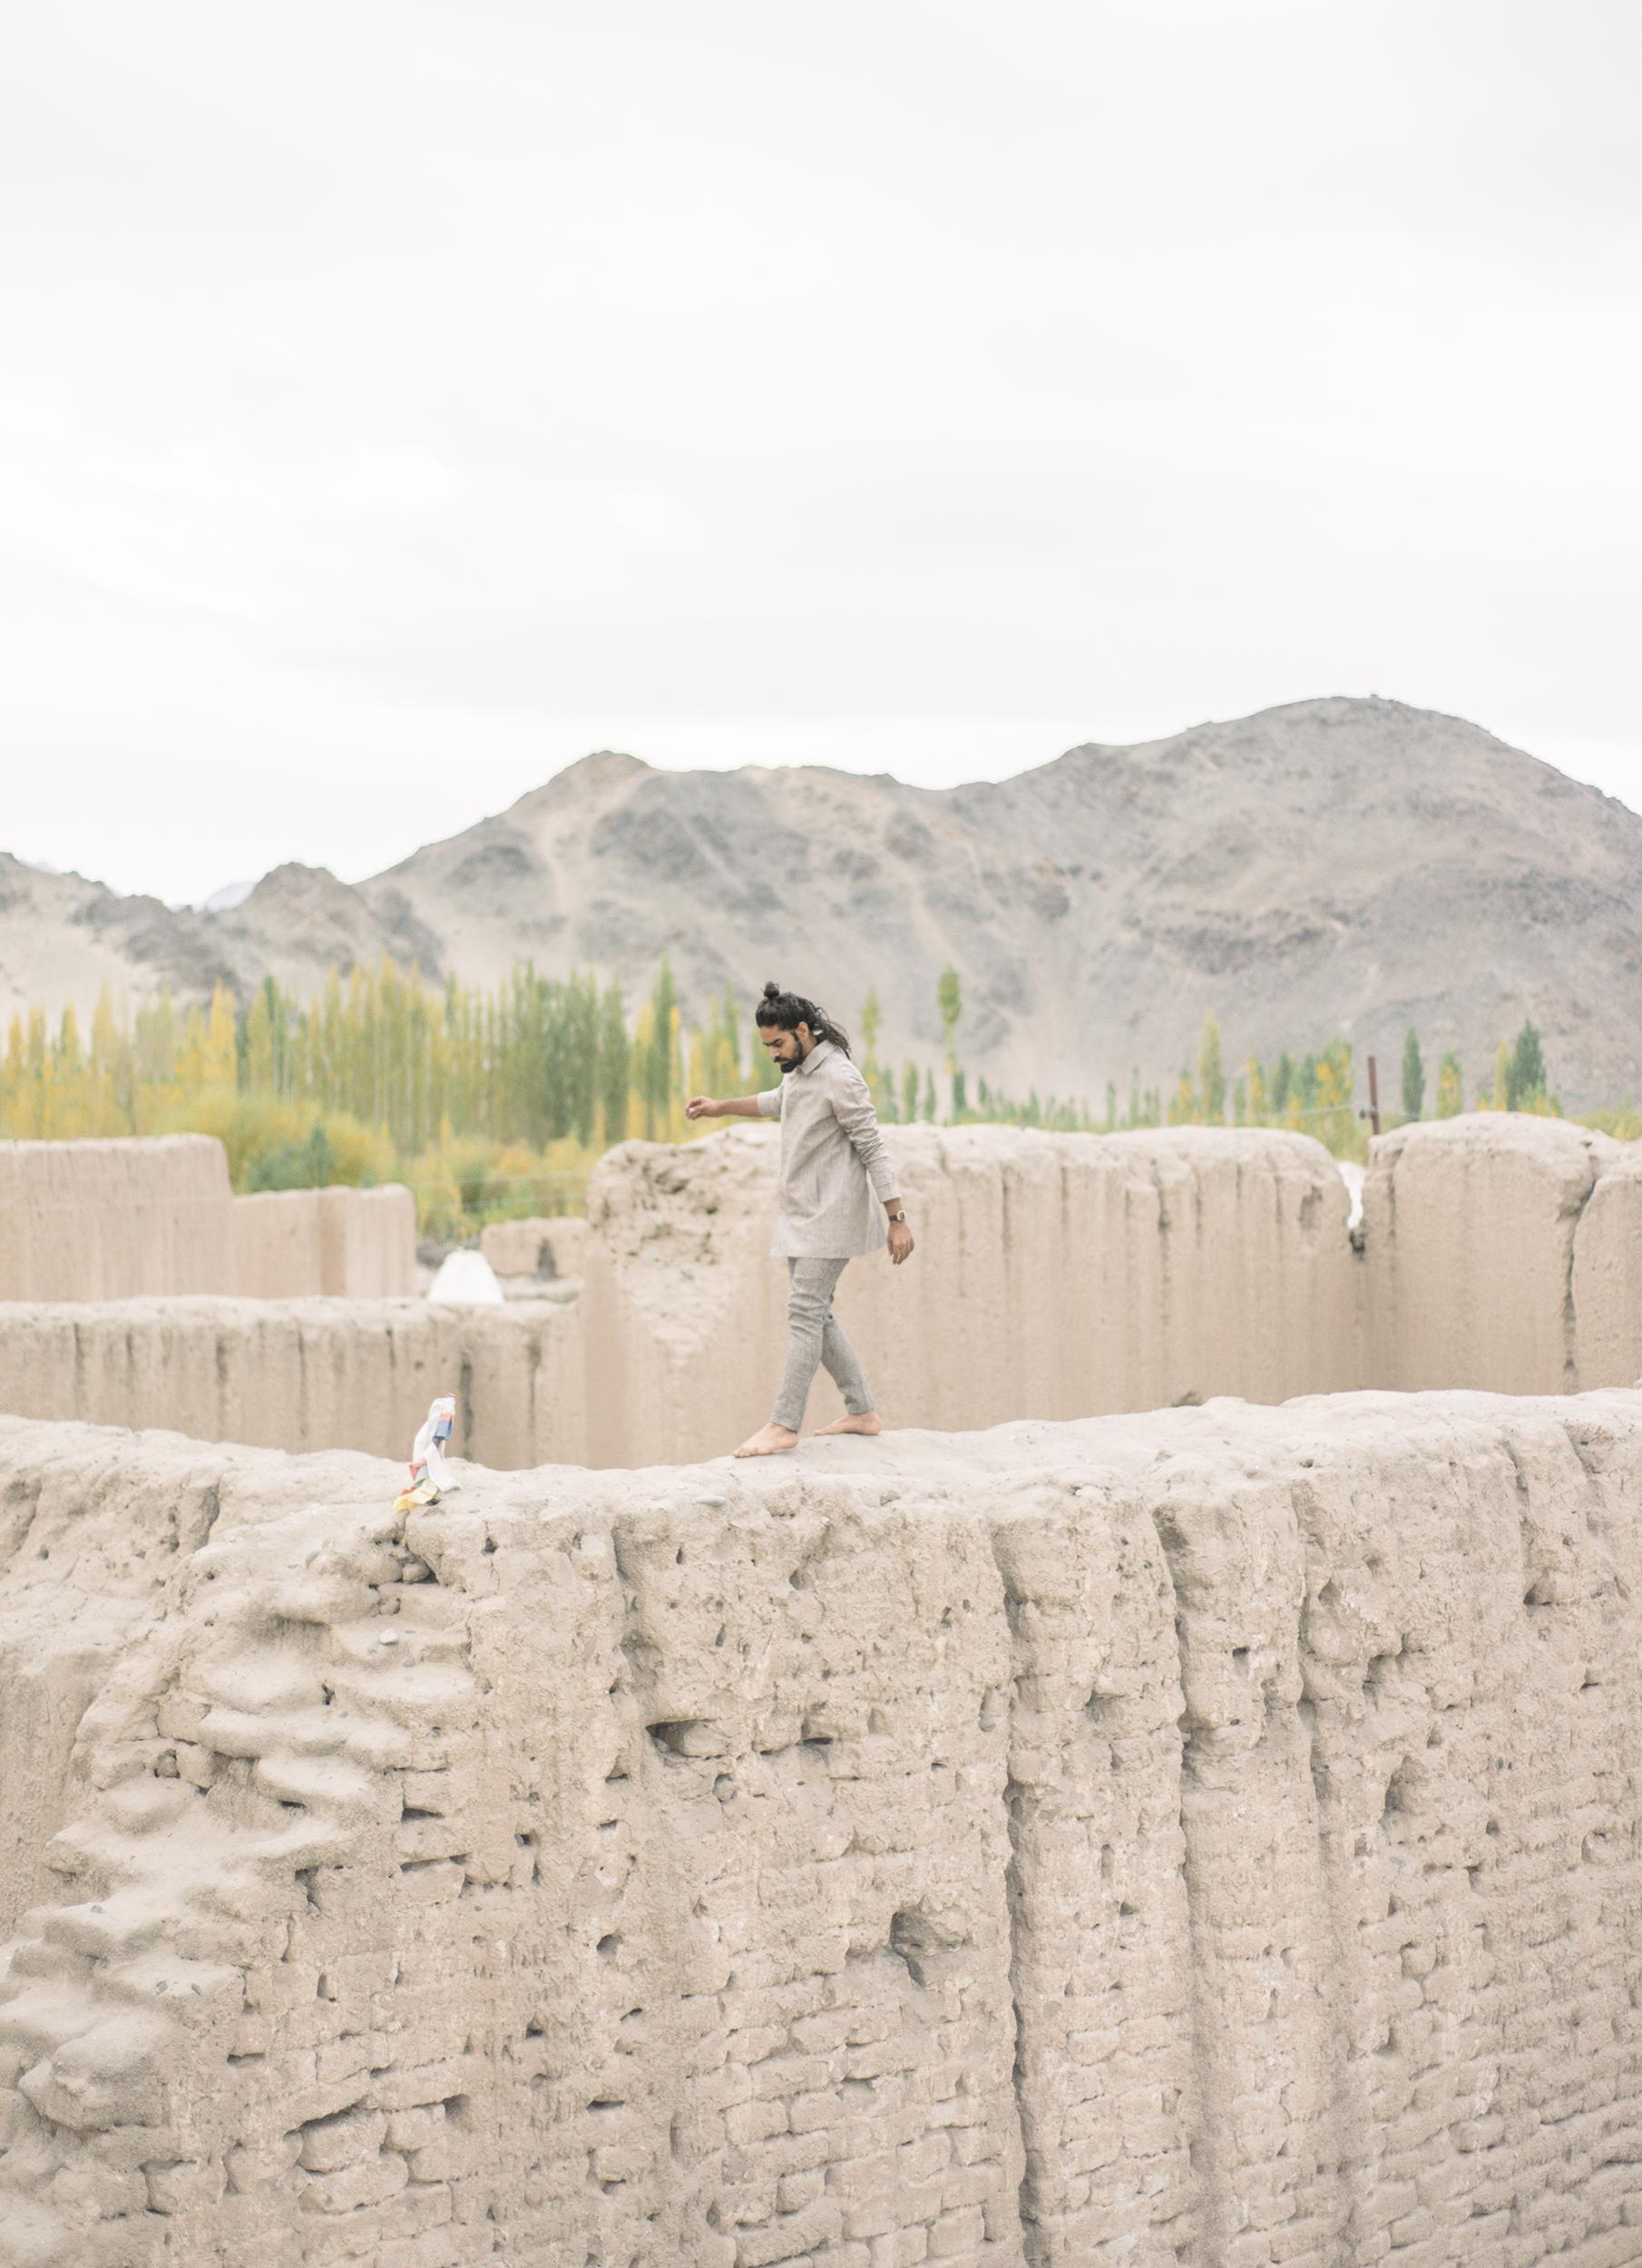 BravoAtelier_MukulBhatia_Bespoke_Suiting_Angola_Ladakh_photographer_Travel78.jpg